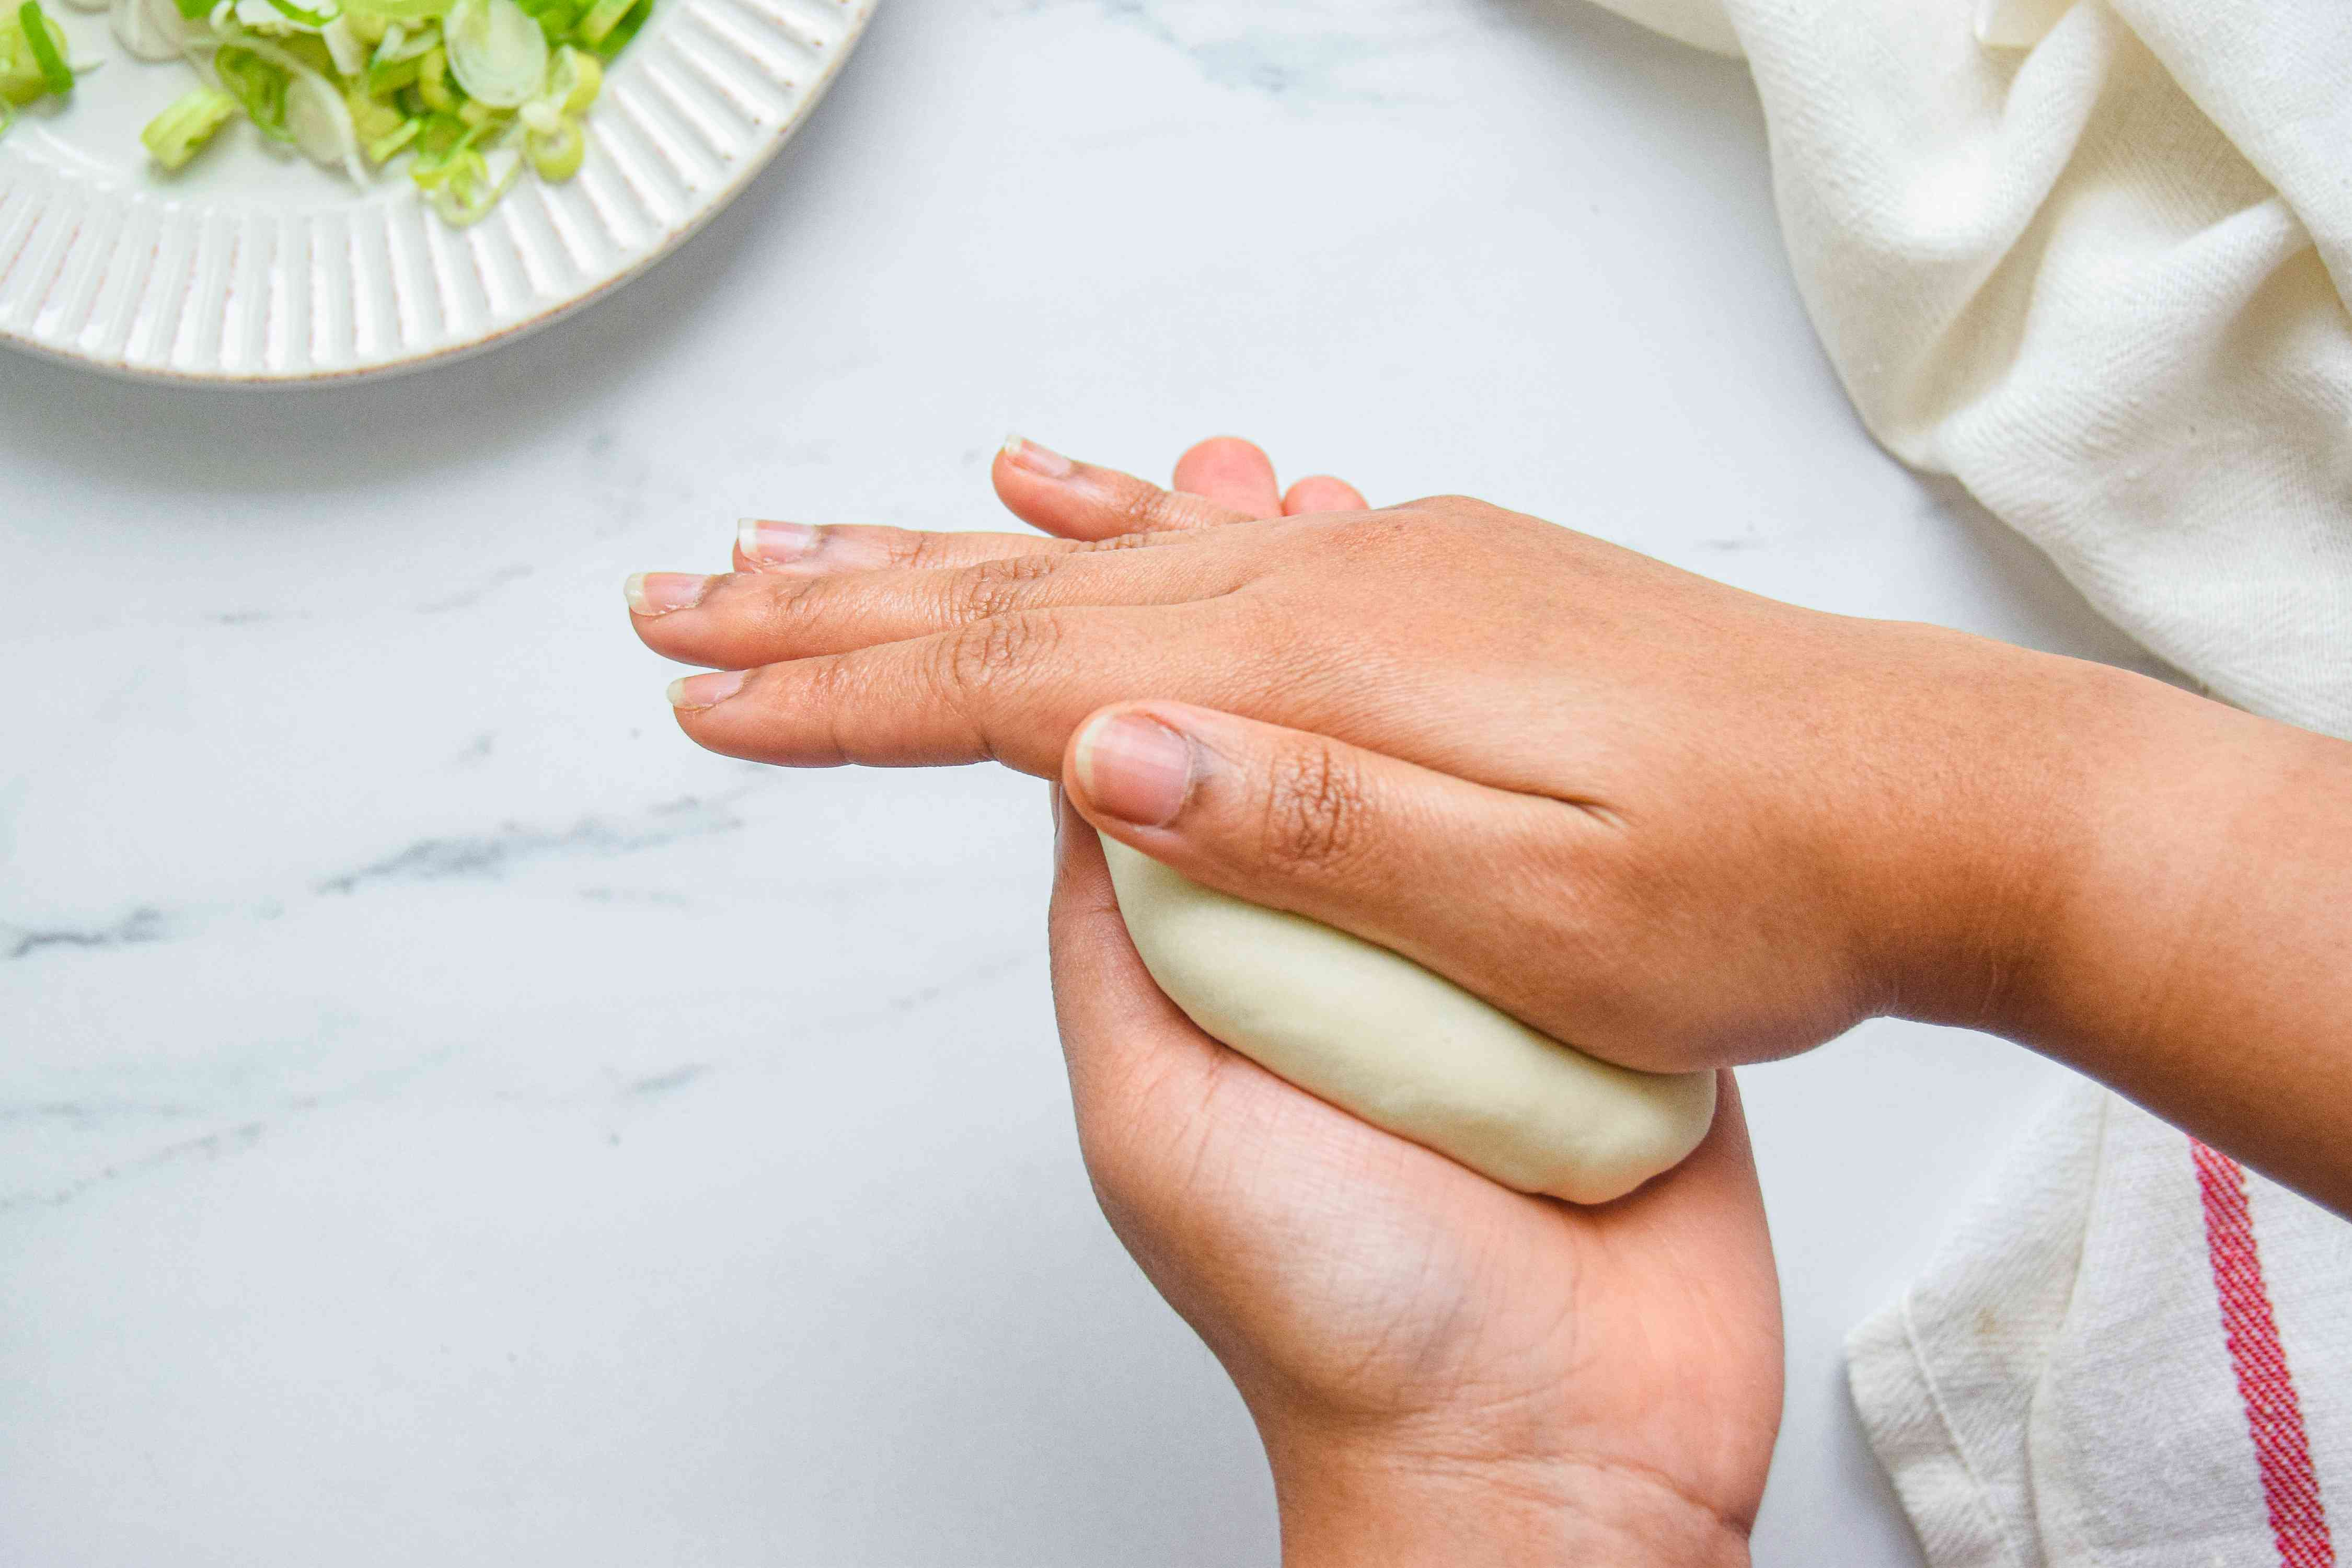 Flattening spiral scallion pancake dough in between hands.